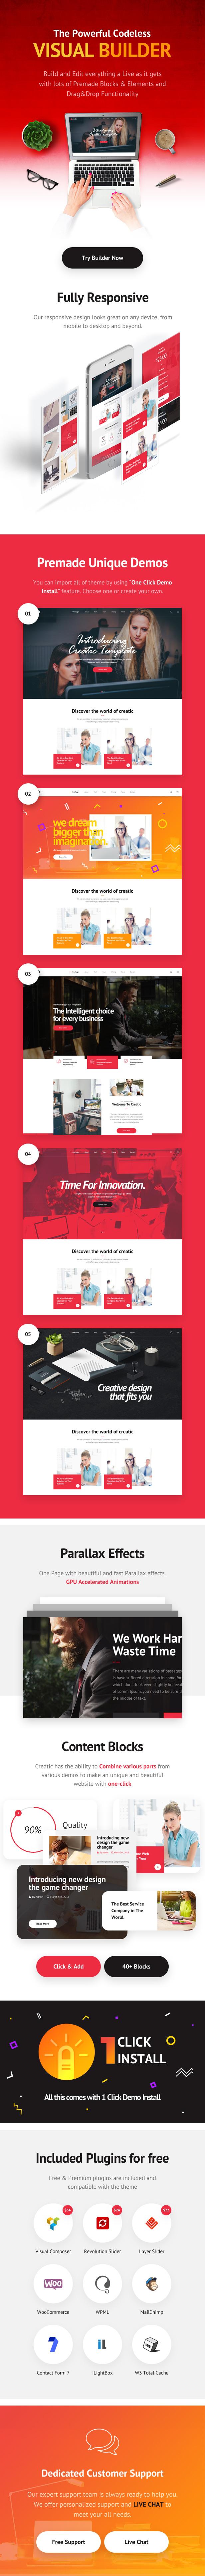 Creatic - One Page Creative Parallax WordPress Theme - 1